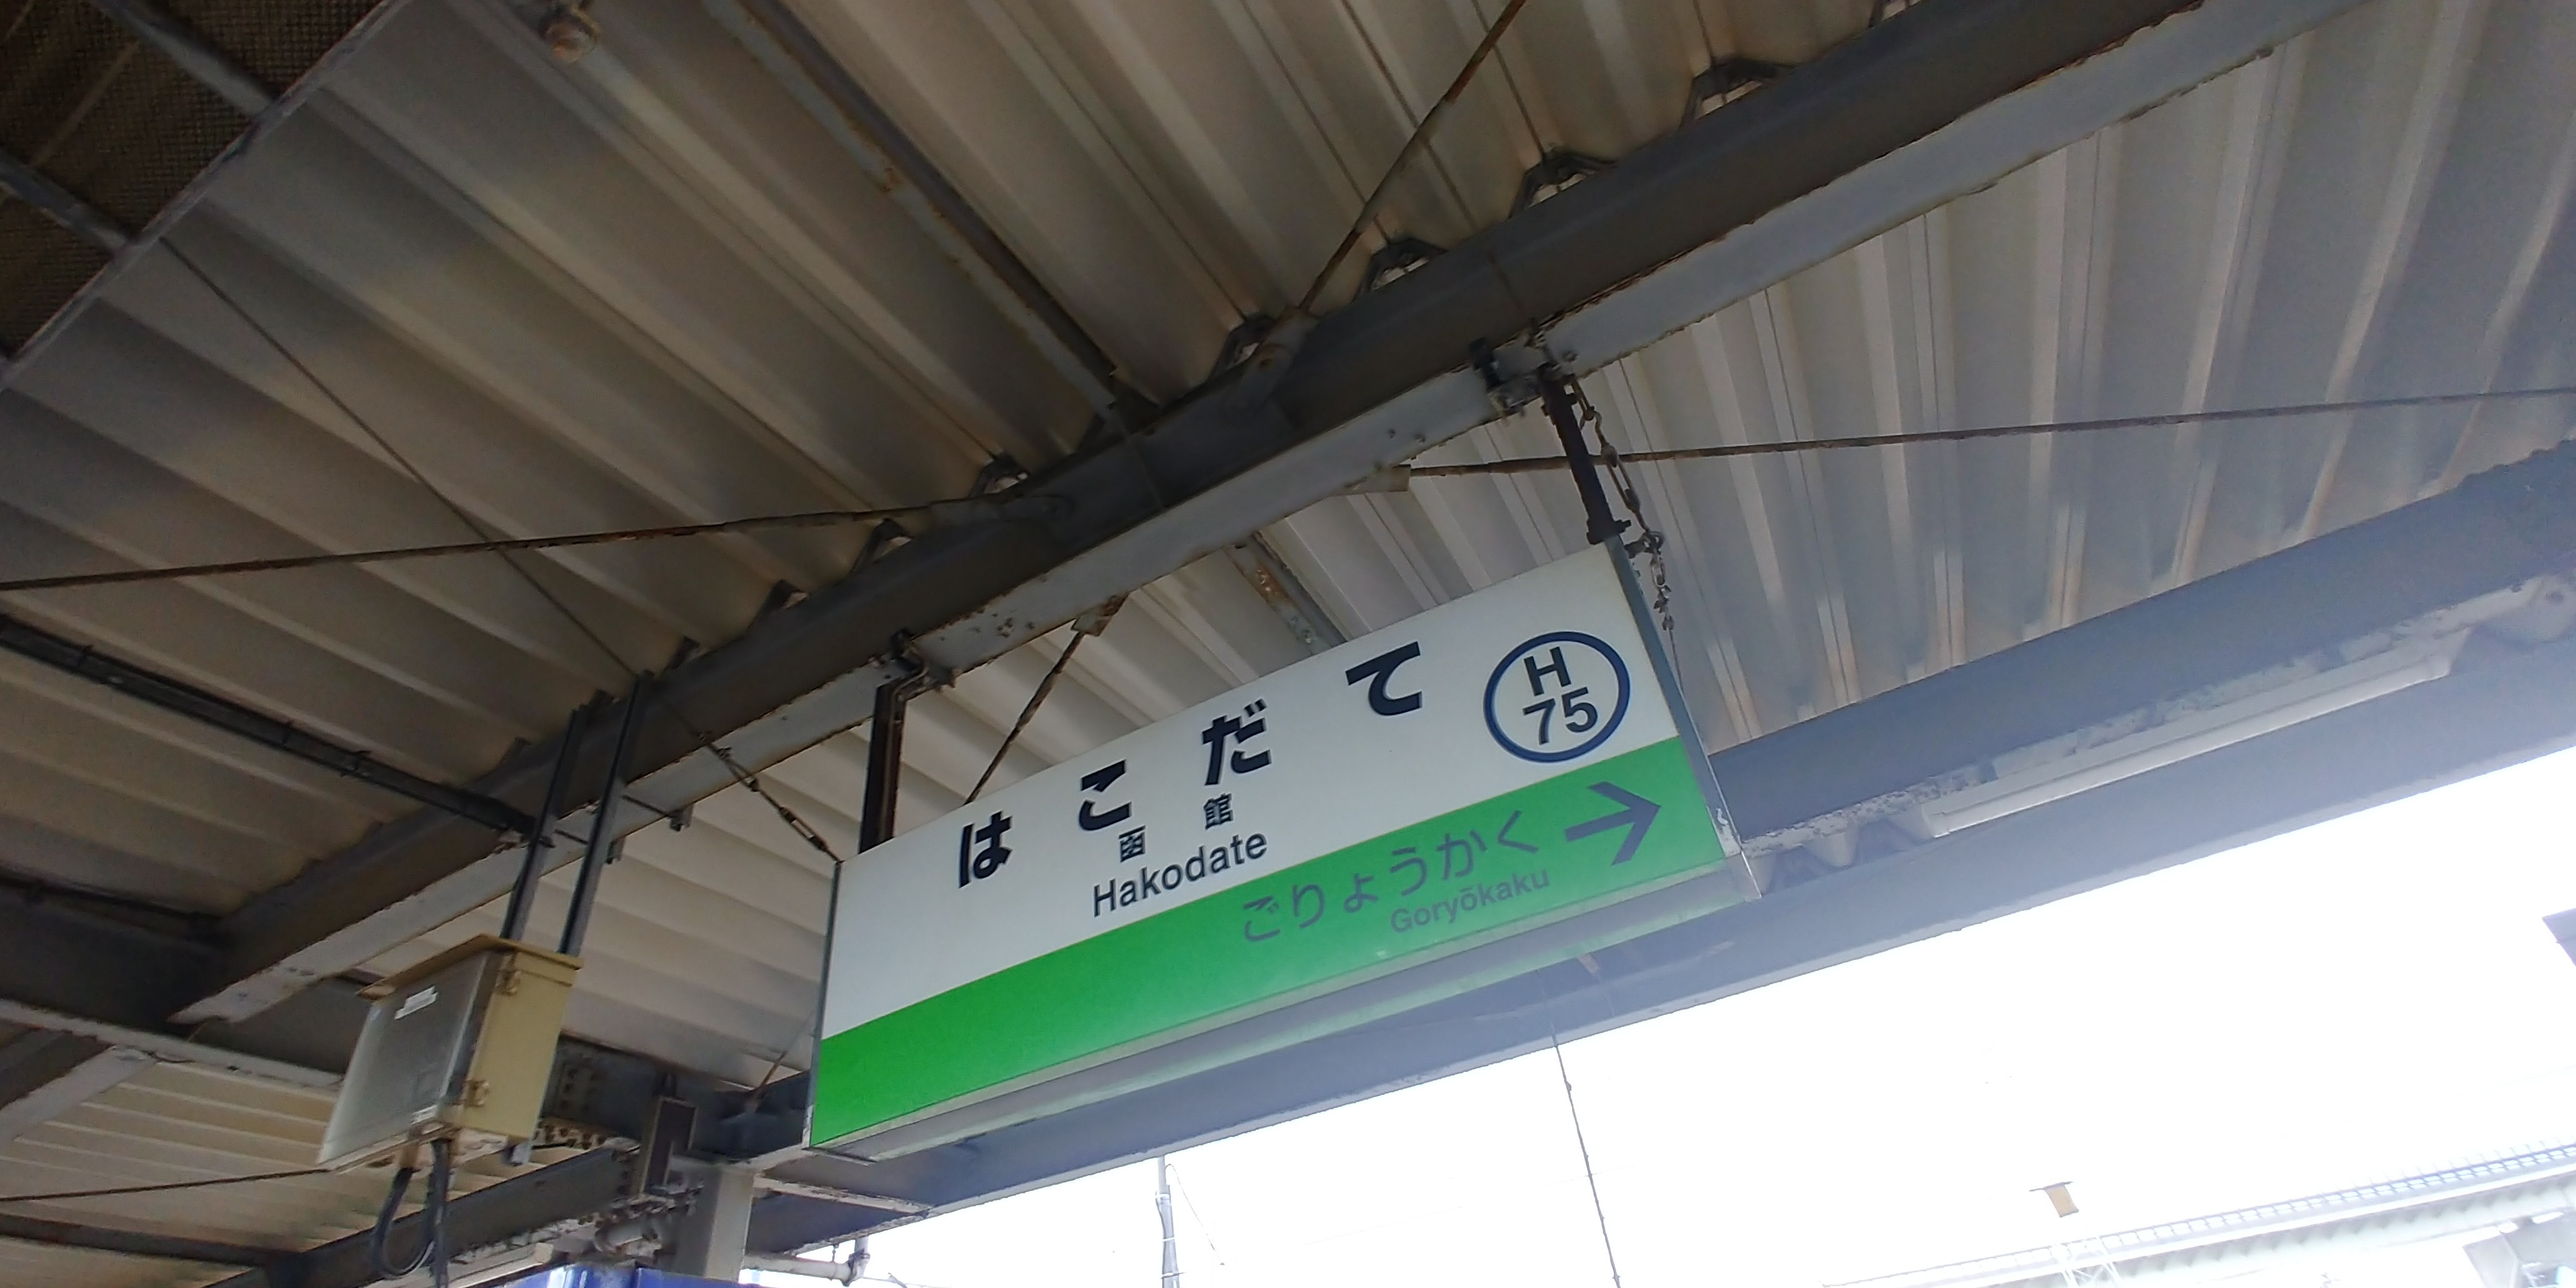 f:id:kishuji-kaisoku:20191228210204j:image